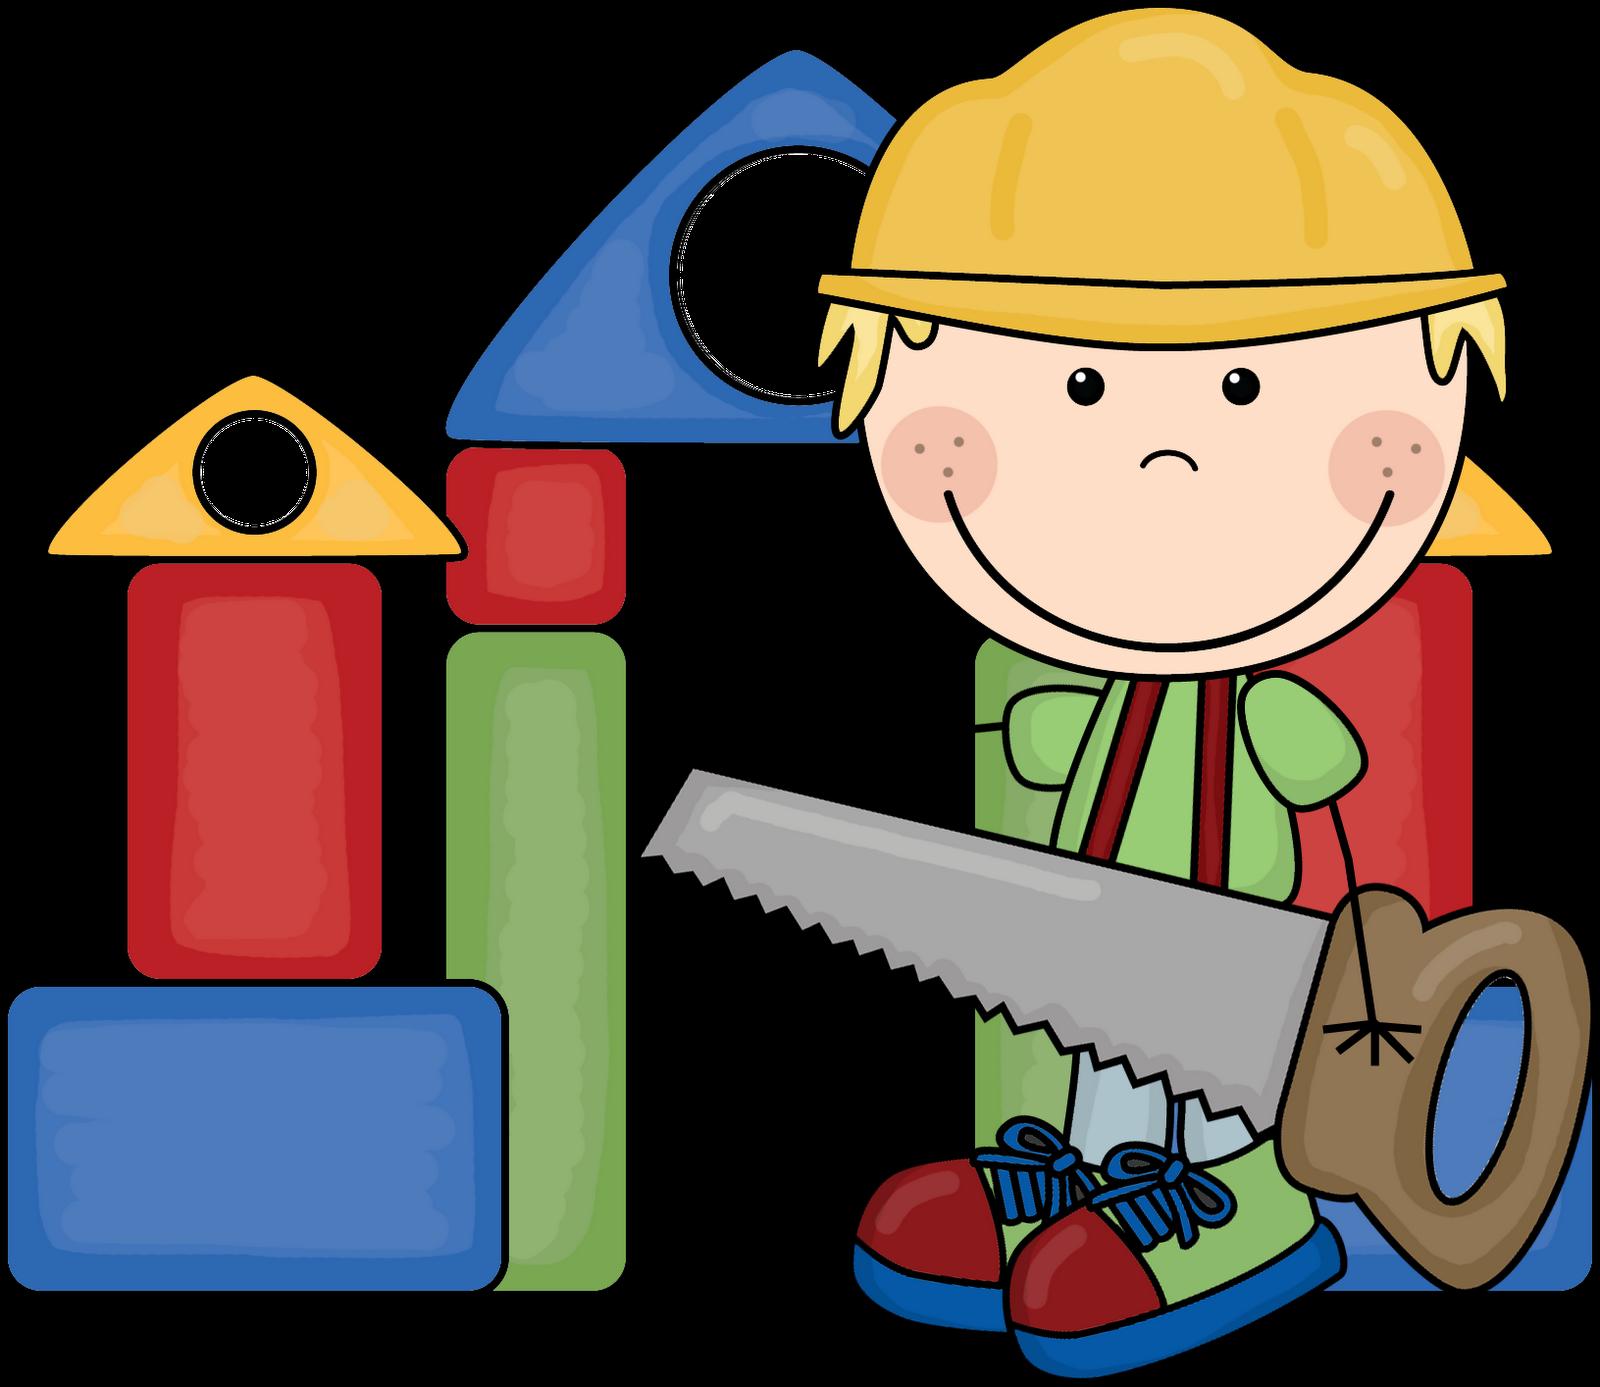 1600x1387 Clip Art Websites For Teachers Cliparts